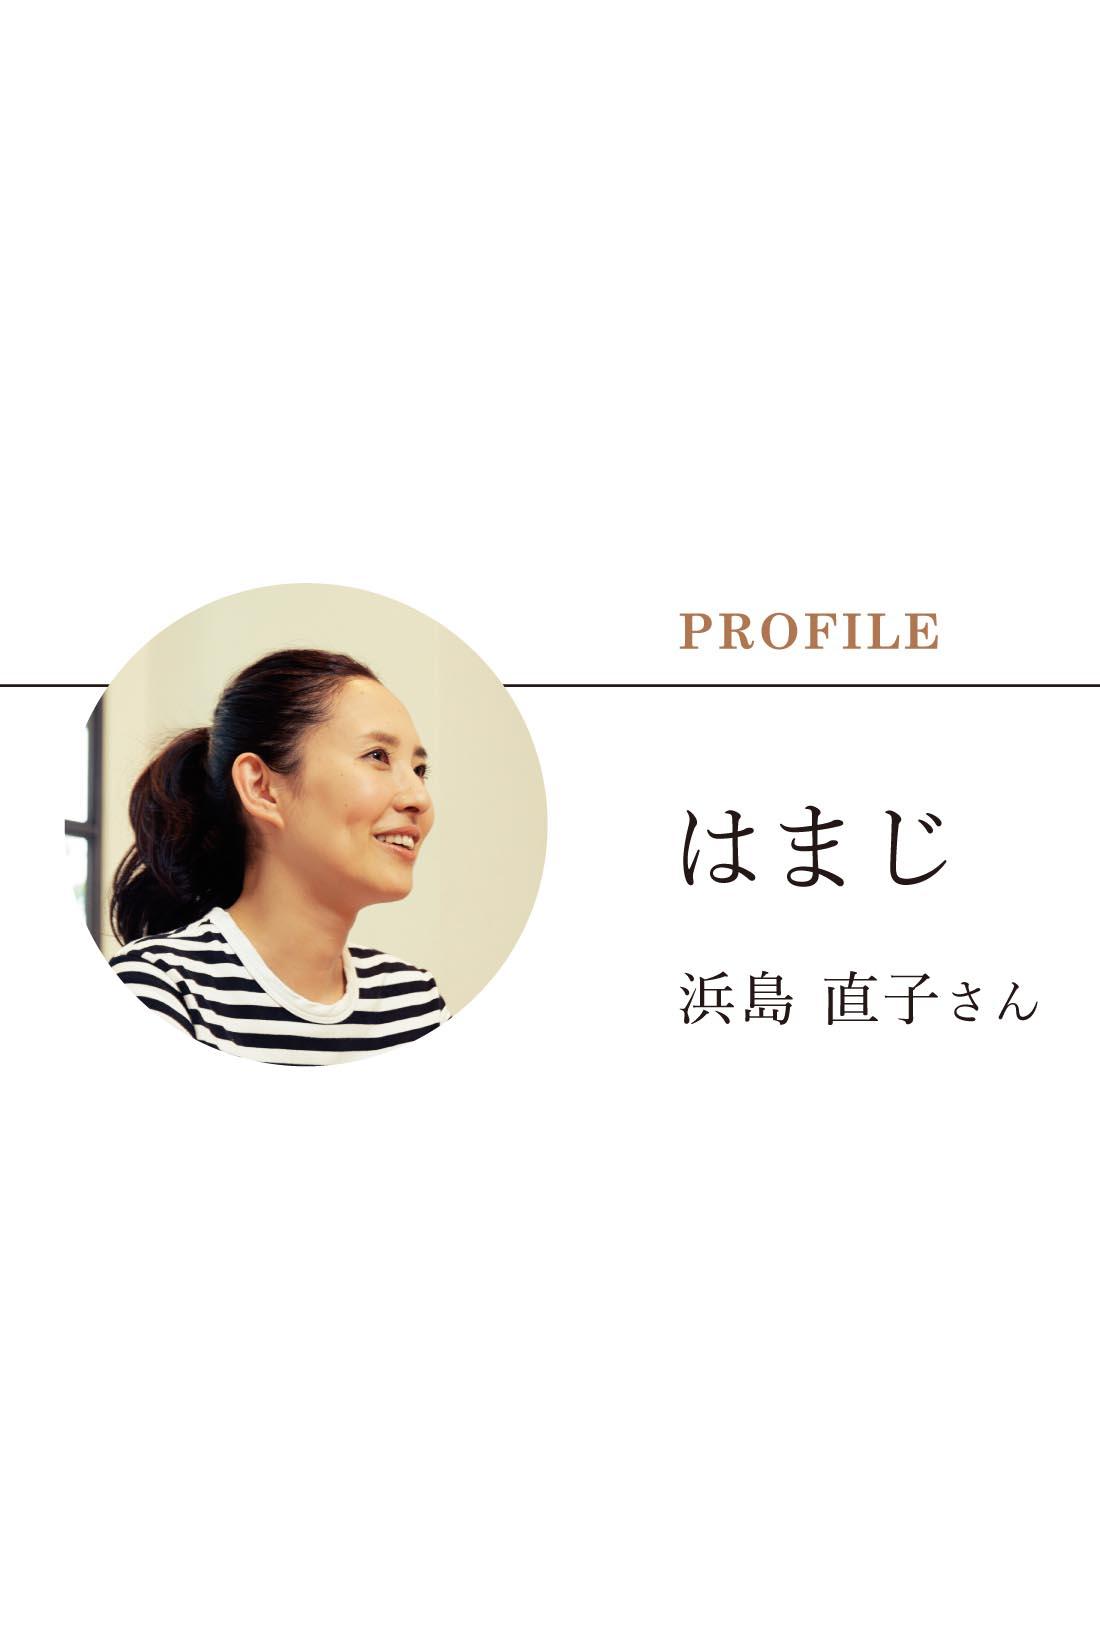 Naoko Hamajima はまじの愛称で親しまれる人気モデル・タレント。集英社『LEE』専属モデル、NHK総合「あさイチ」、TBS「暮らしのレシピ」ナビゲーター、TBS「世界ふしぎ発見!」ミステリーハンター、bayfm78「Curious HAMAJI」パーソナリティーなど、テレビやラジオで幅広く活躍。ユーモアたっぷりにつづるInstagram(@hamaji_0912)も大好評。